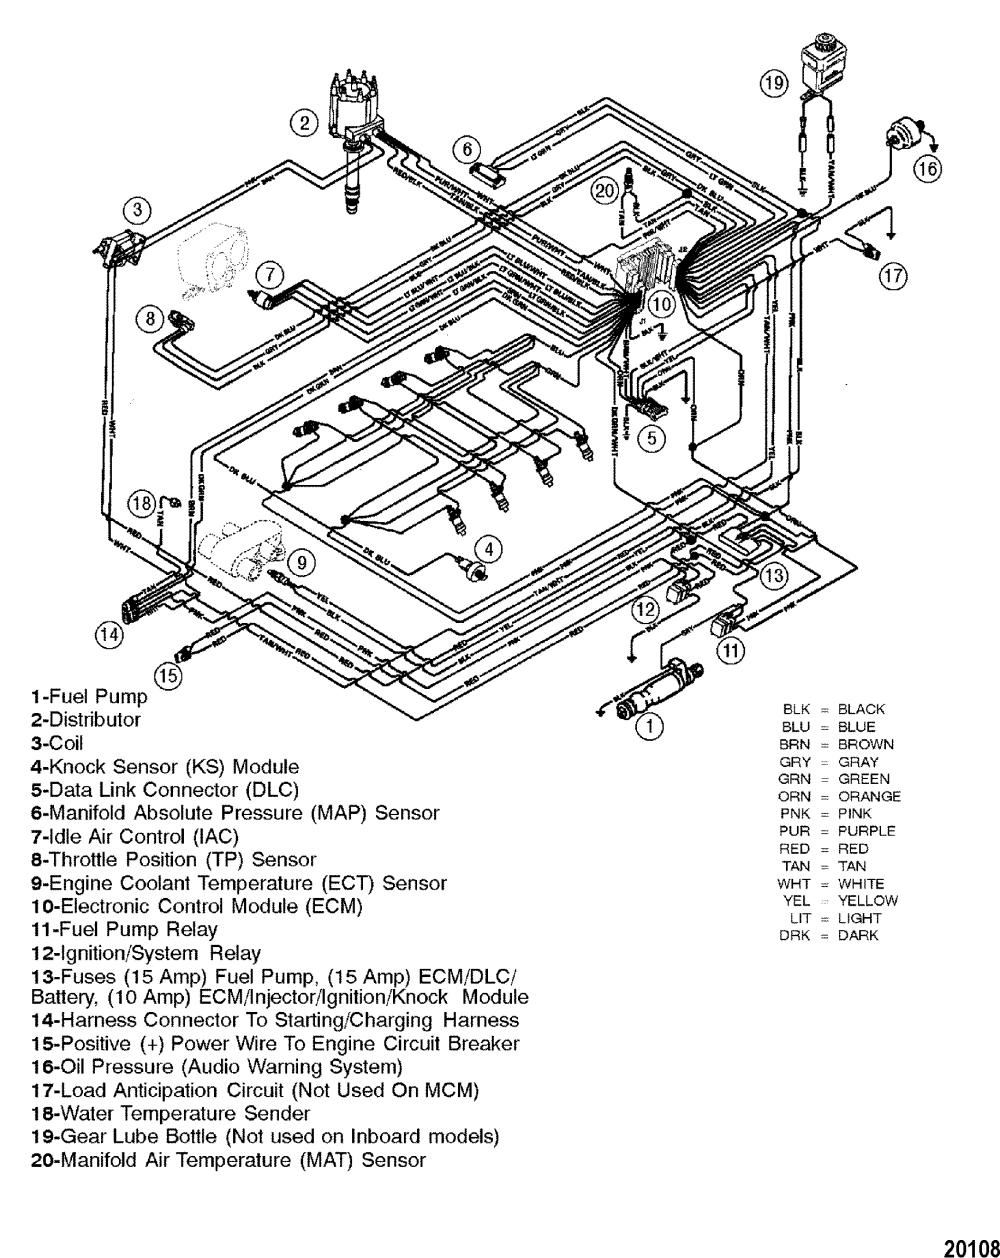 medium resolution of mercruiser fuse box 454 mercruiser wiring diagram 470 mercruiser wiring diagram mercruiser 454 wiring diagram mercruiser